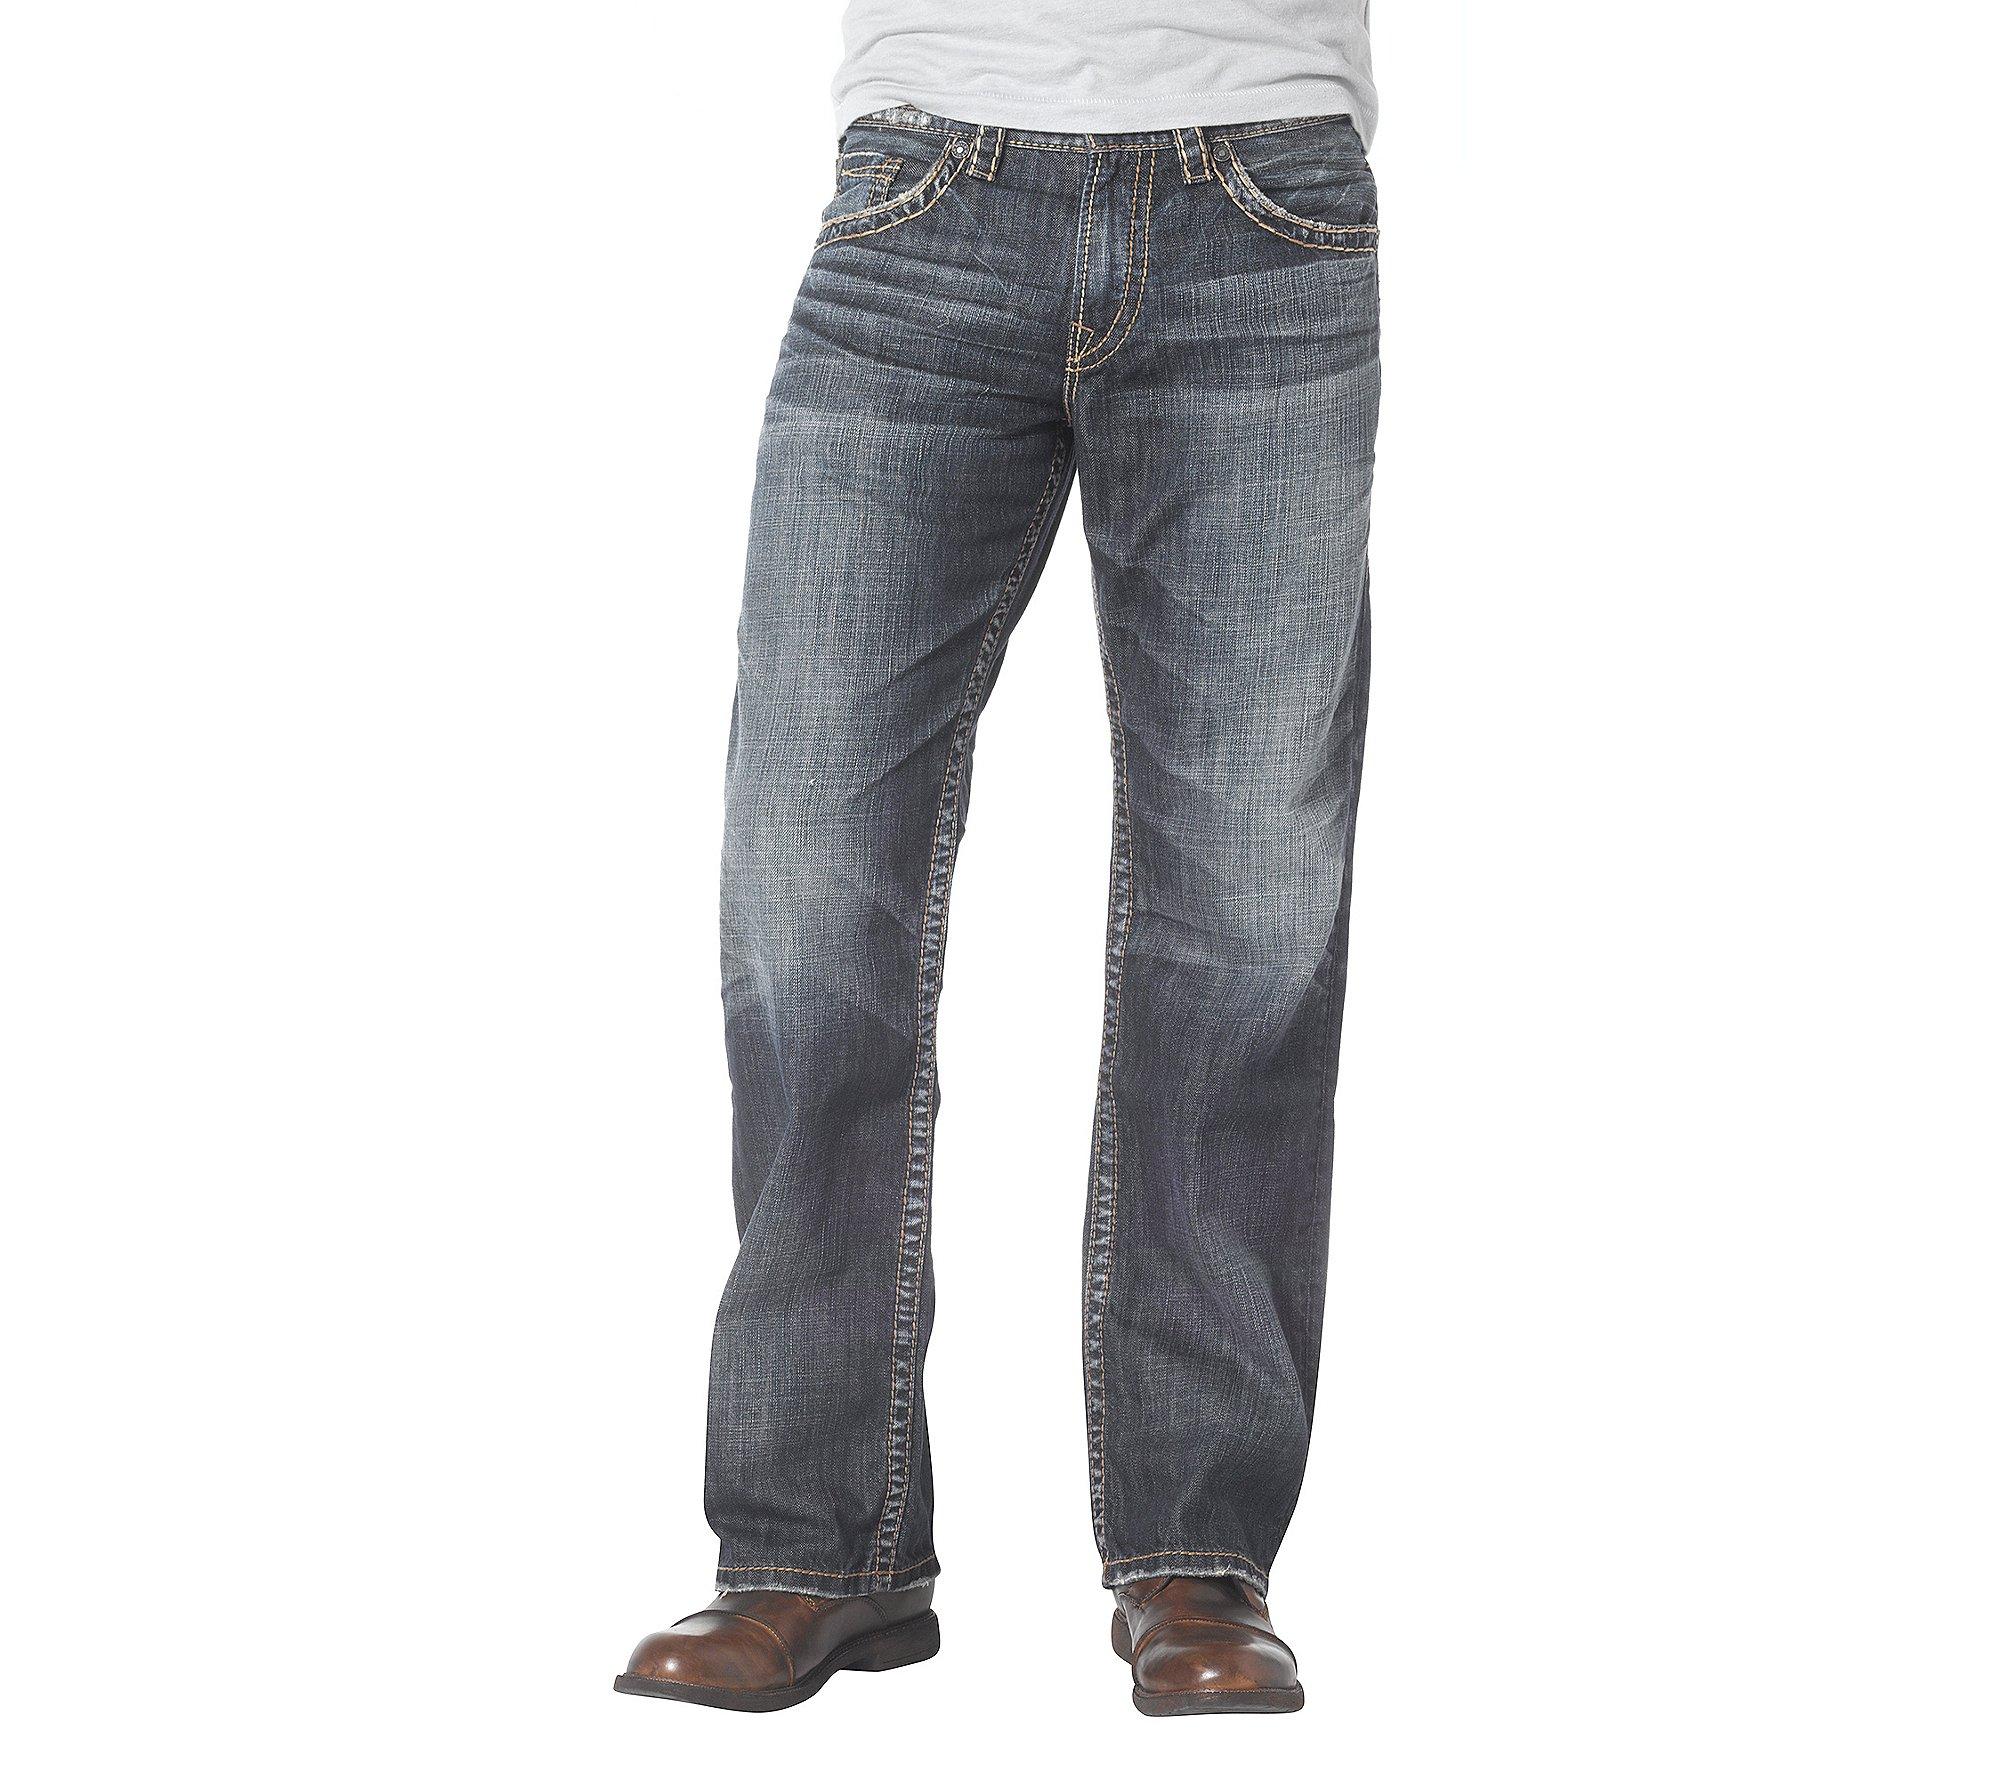 Silver Jeans Men's Craig Easy Fit Bootcut, Dark Heritage Wash, 30 x 32